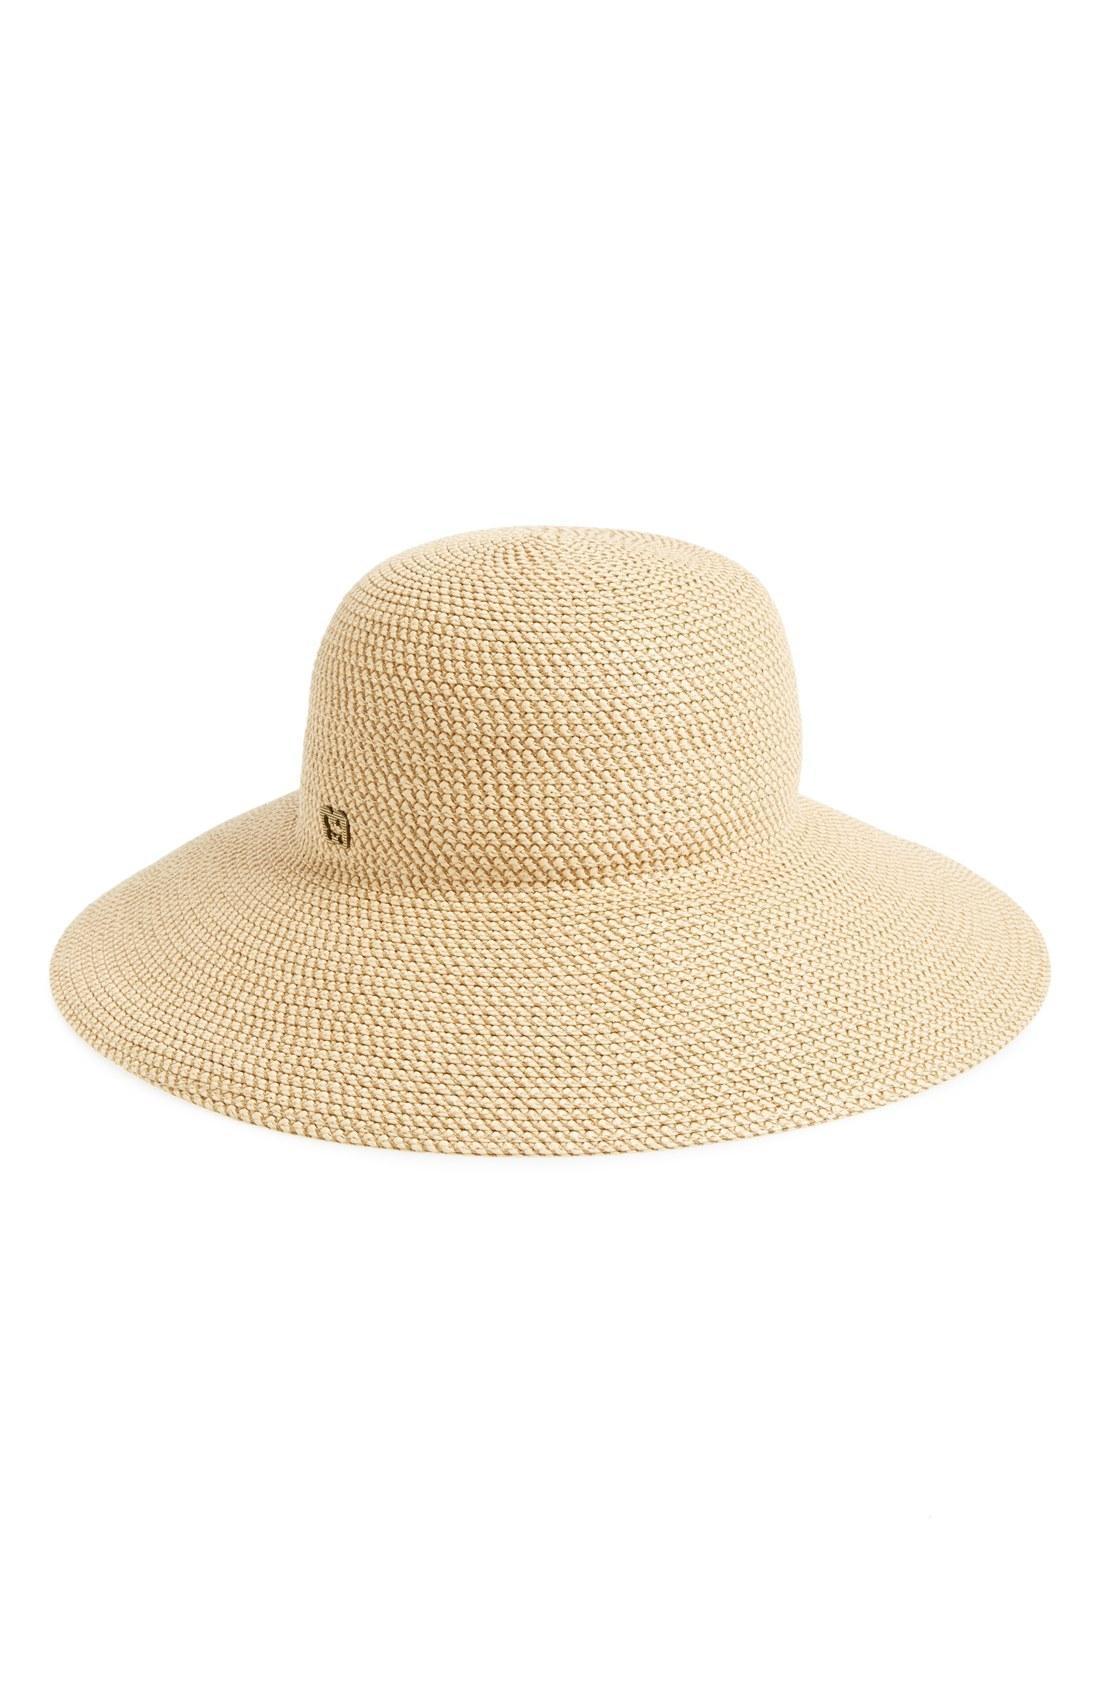 7acb2f477c310 Eric Javits  Hampton  Straw Sun Hat In Peanut